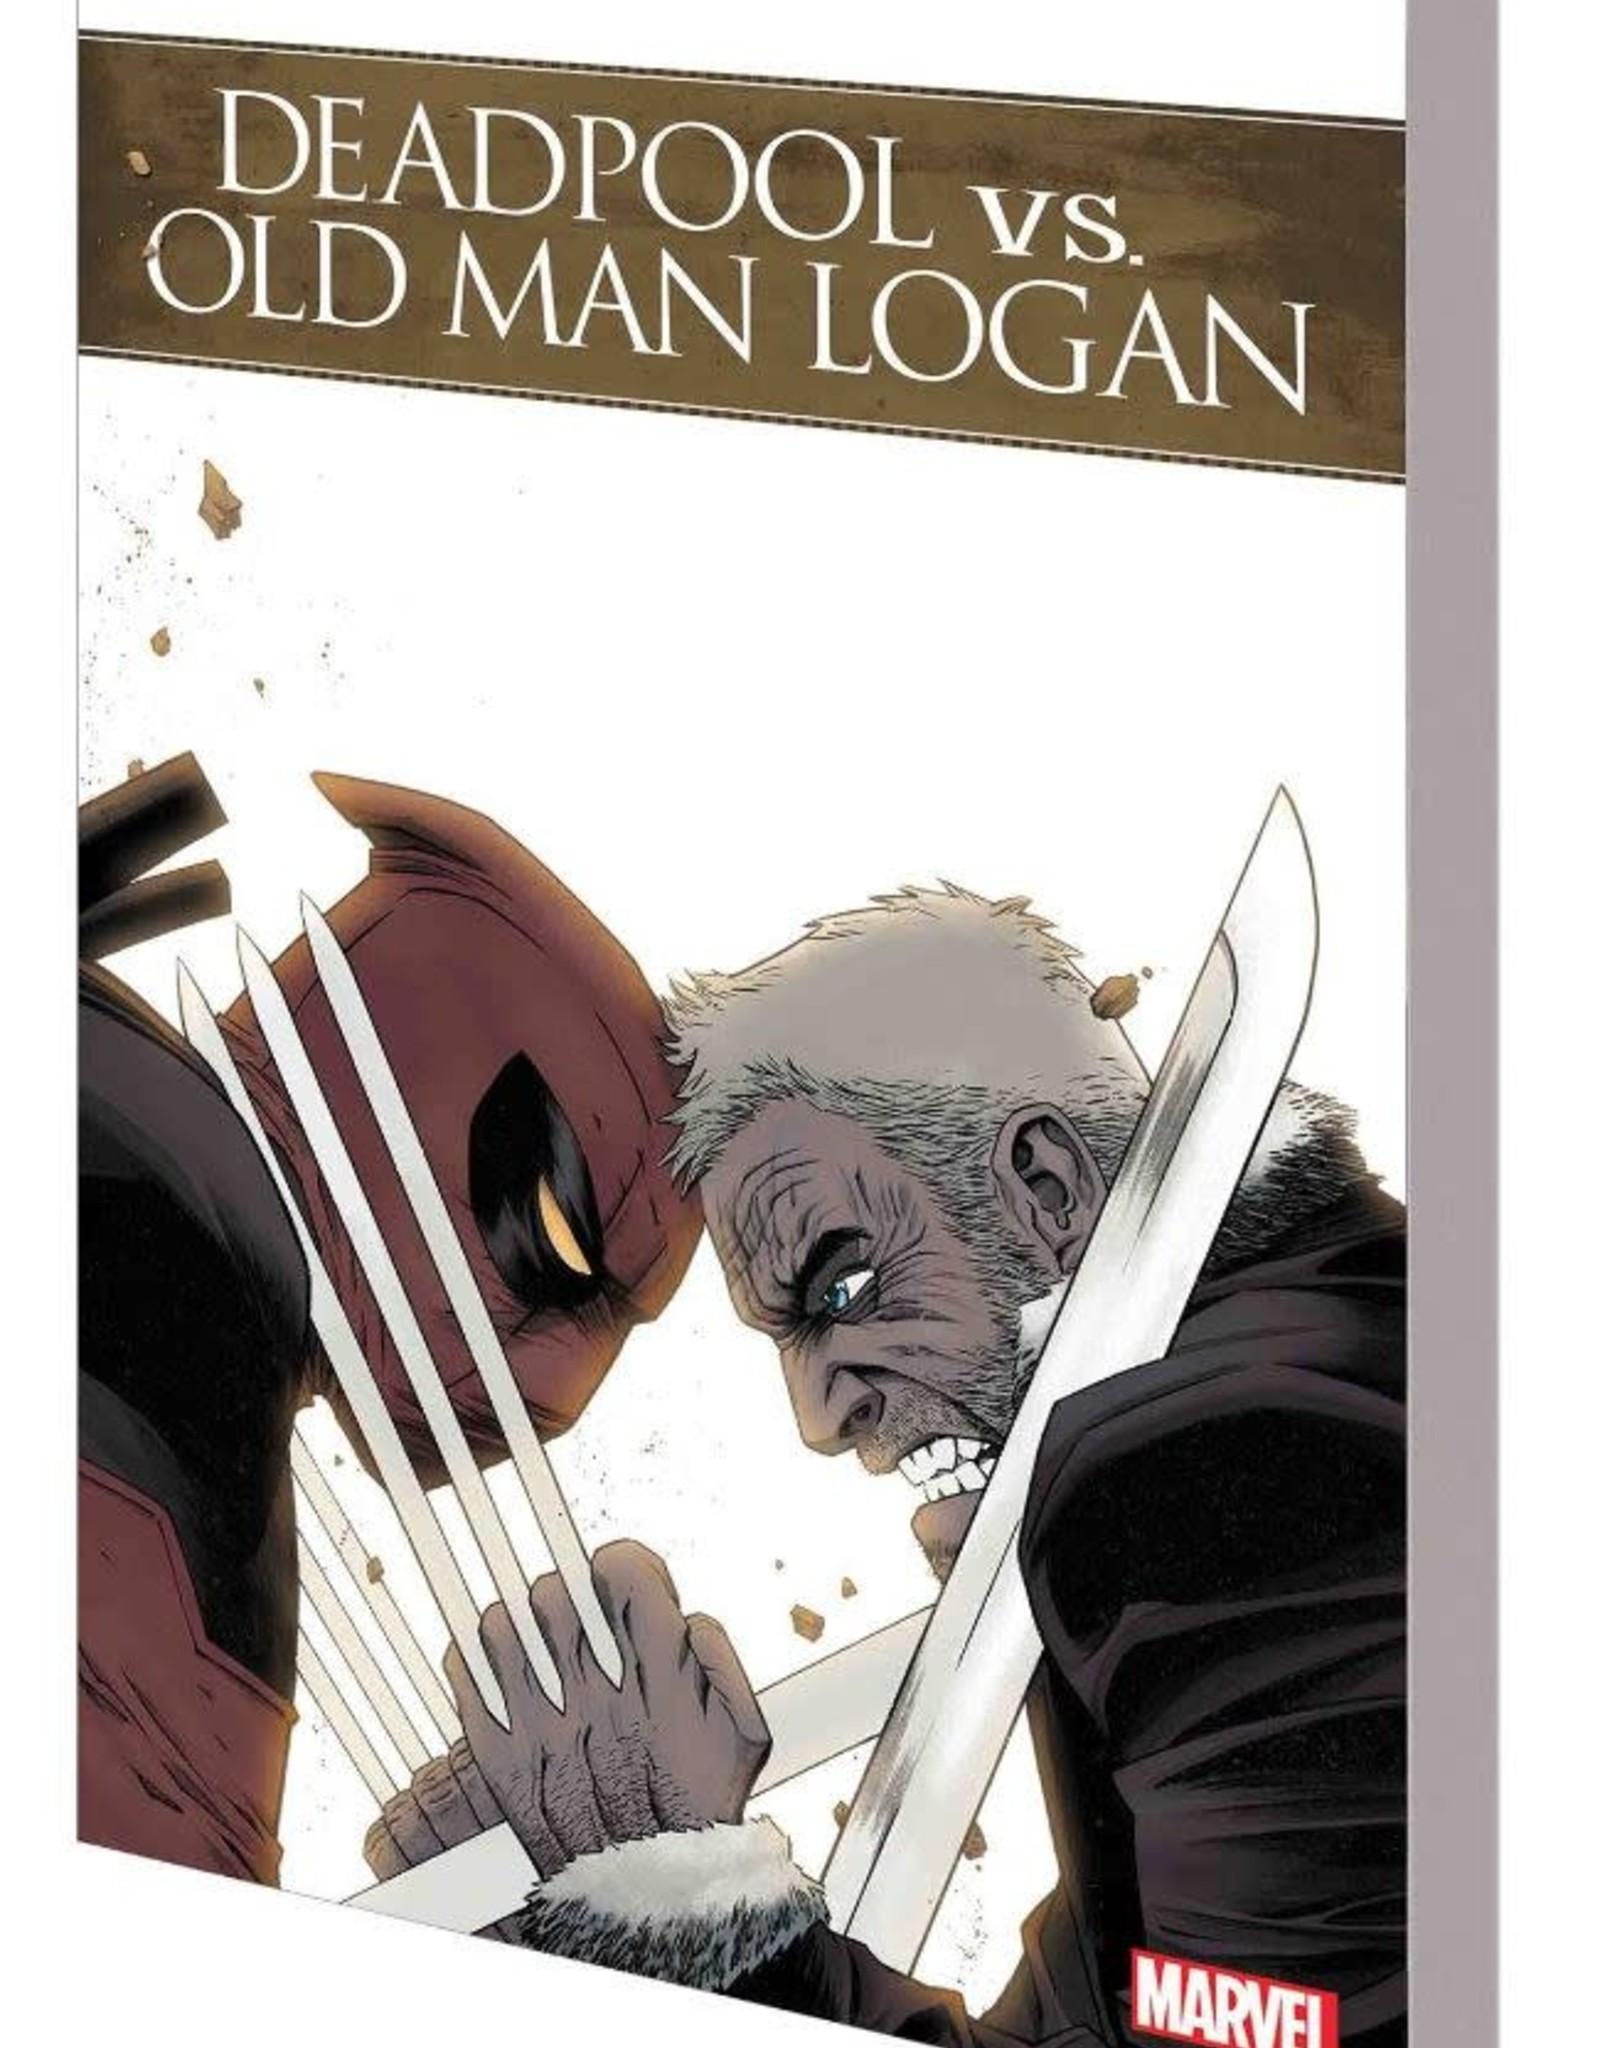 Marvel Comics Deadpool vs Old Man Logan